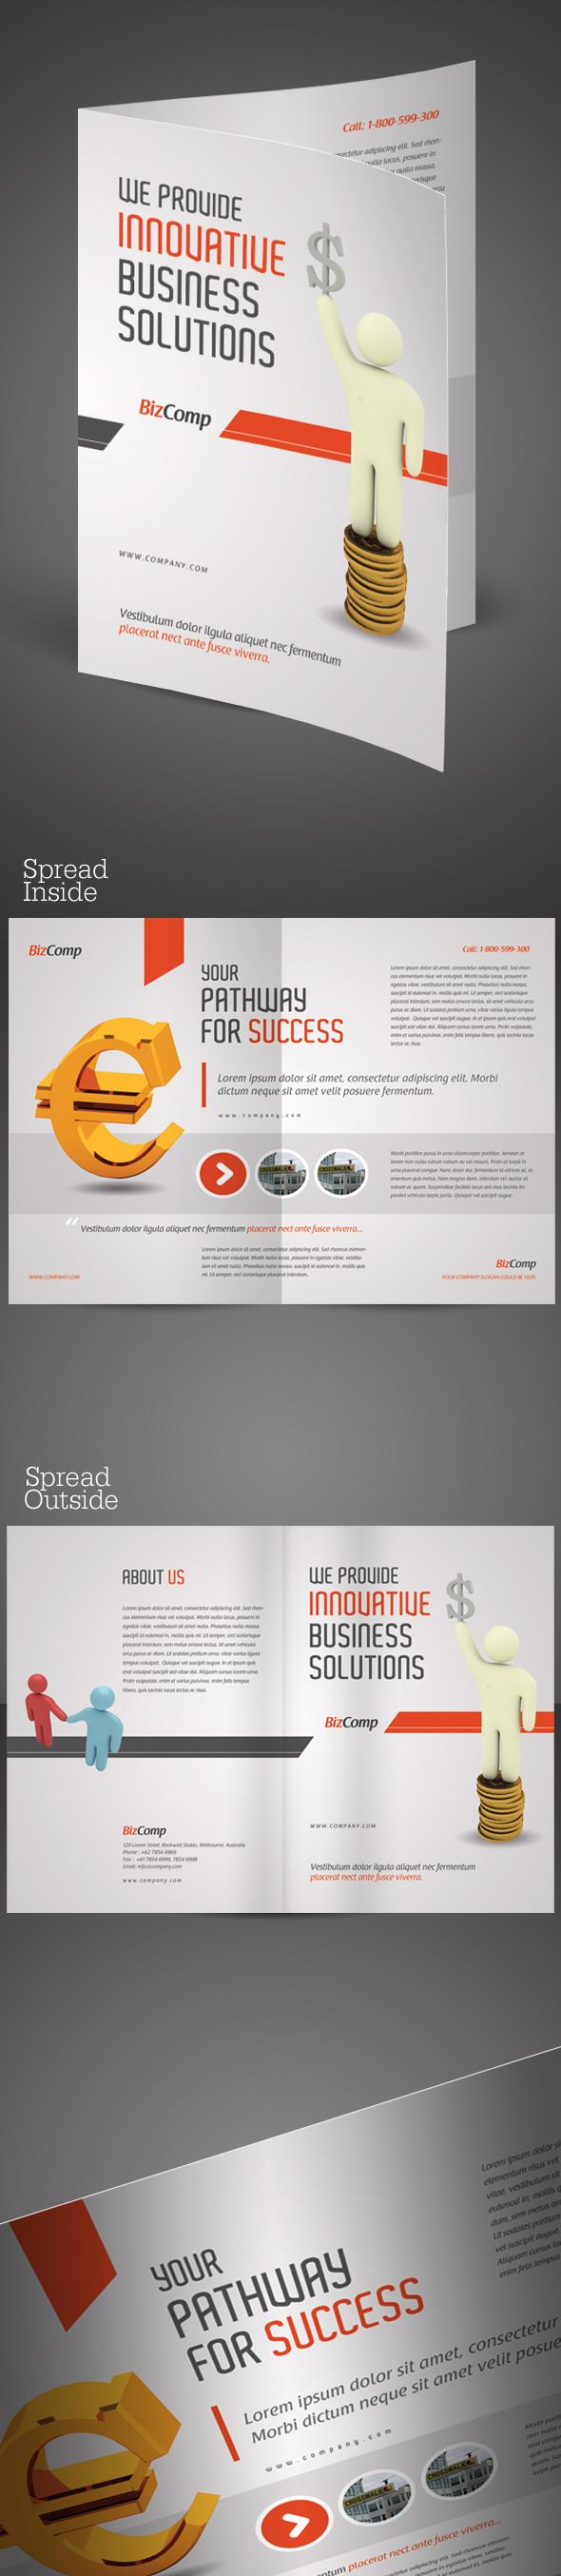 A Halffold Brochure Template On Behance - Half fold brochure template word